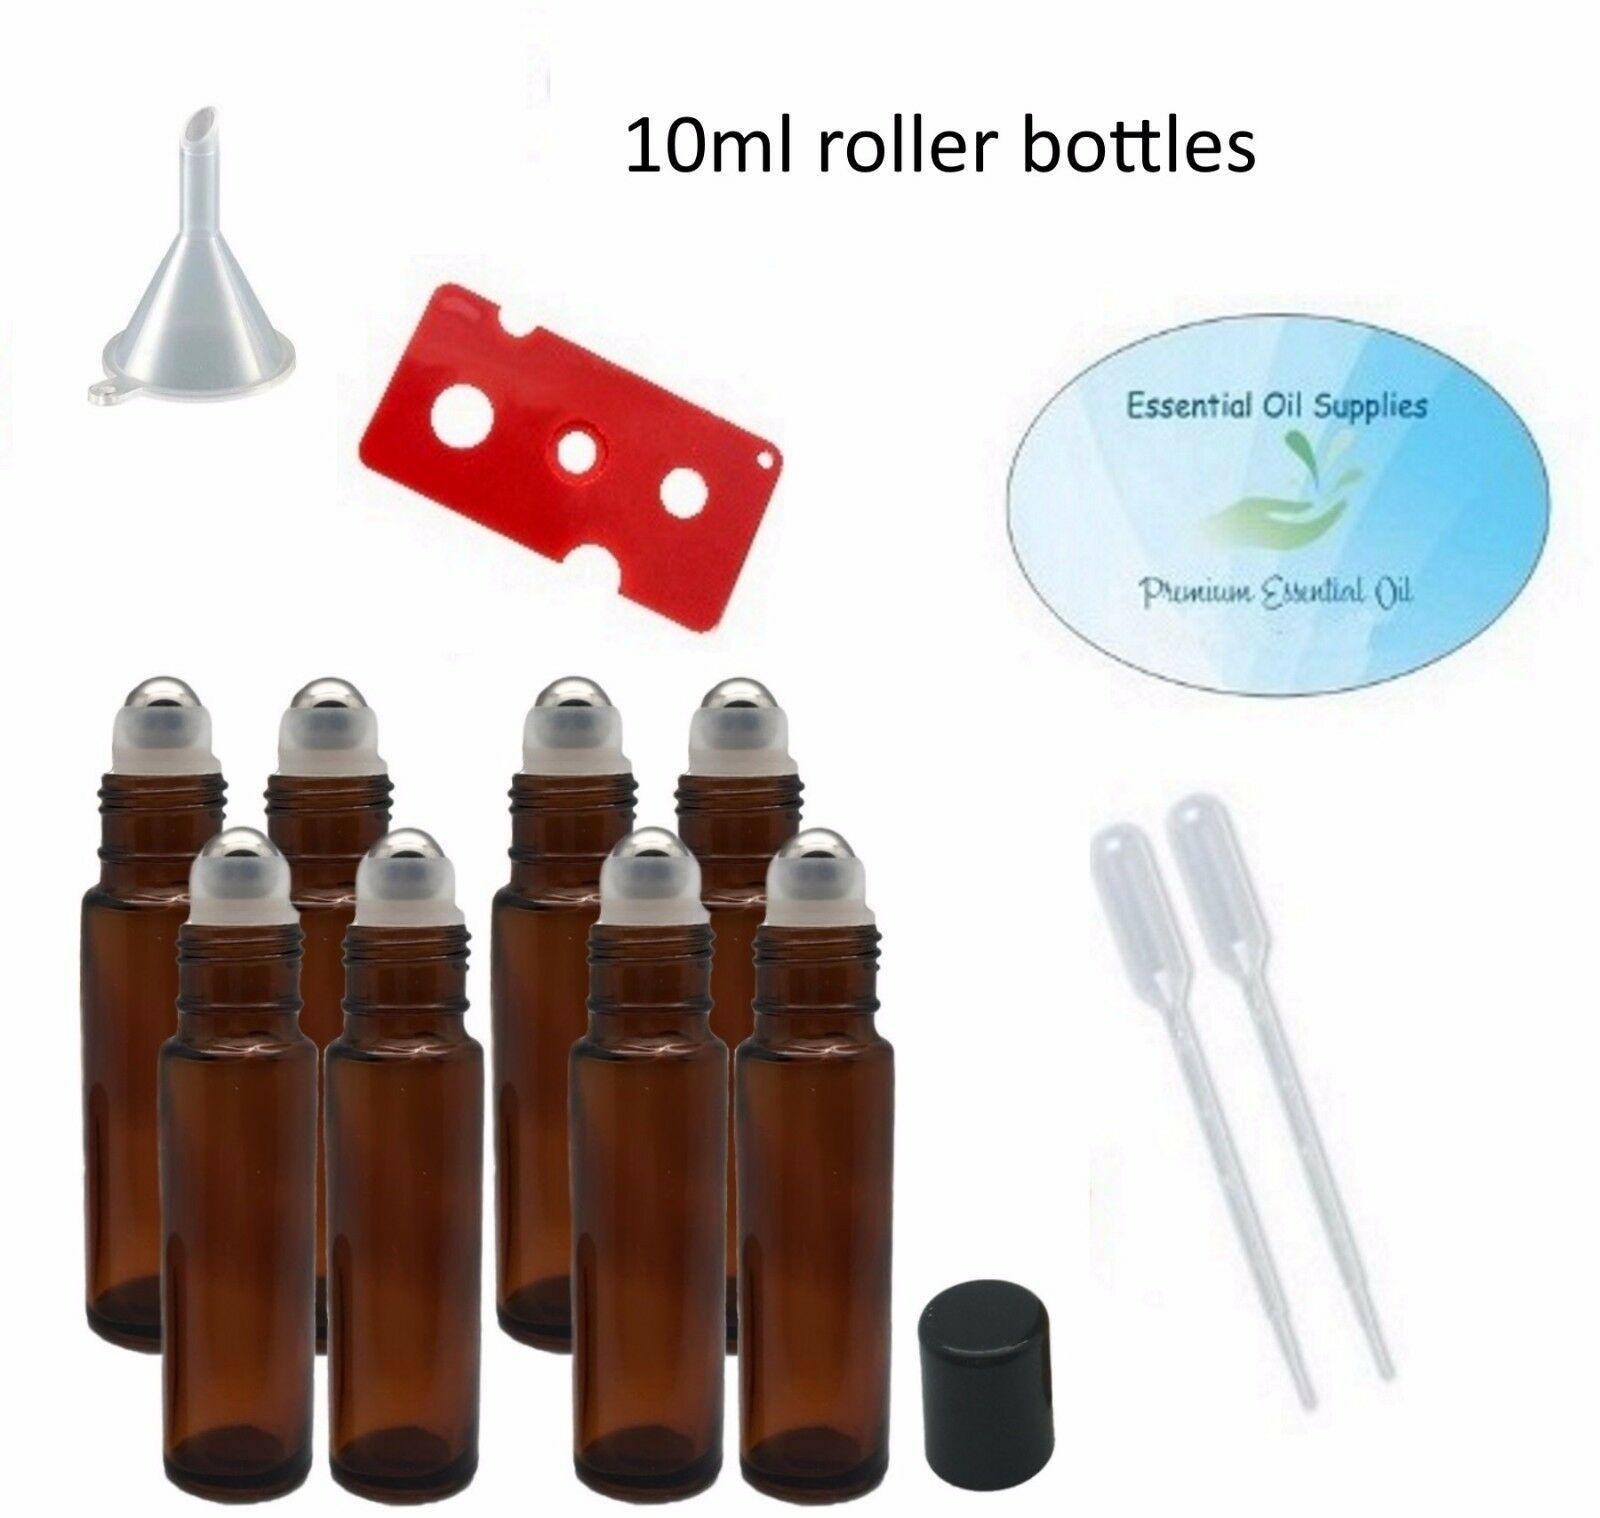 10ml Amber Roller Bottles With Steel Balls Funnel Pipettesessential Oil Opener Amber Bottles Ideas Of Am Amber Bottles Roller Bottle Essential Oil Supplies